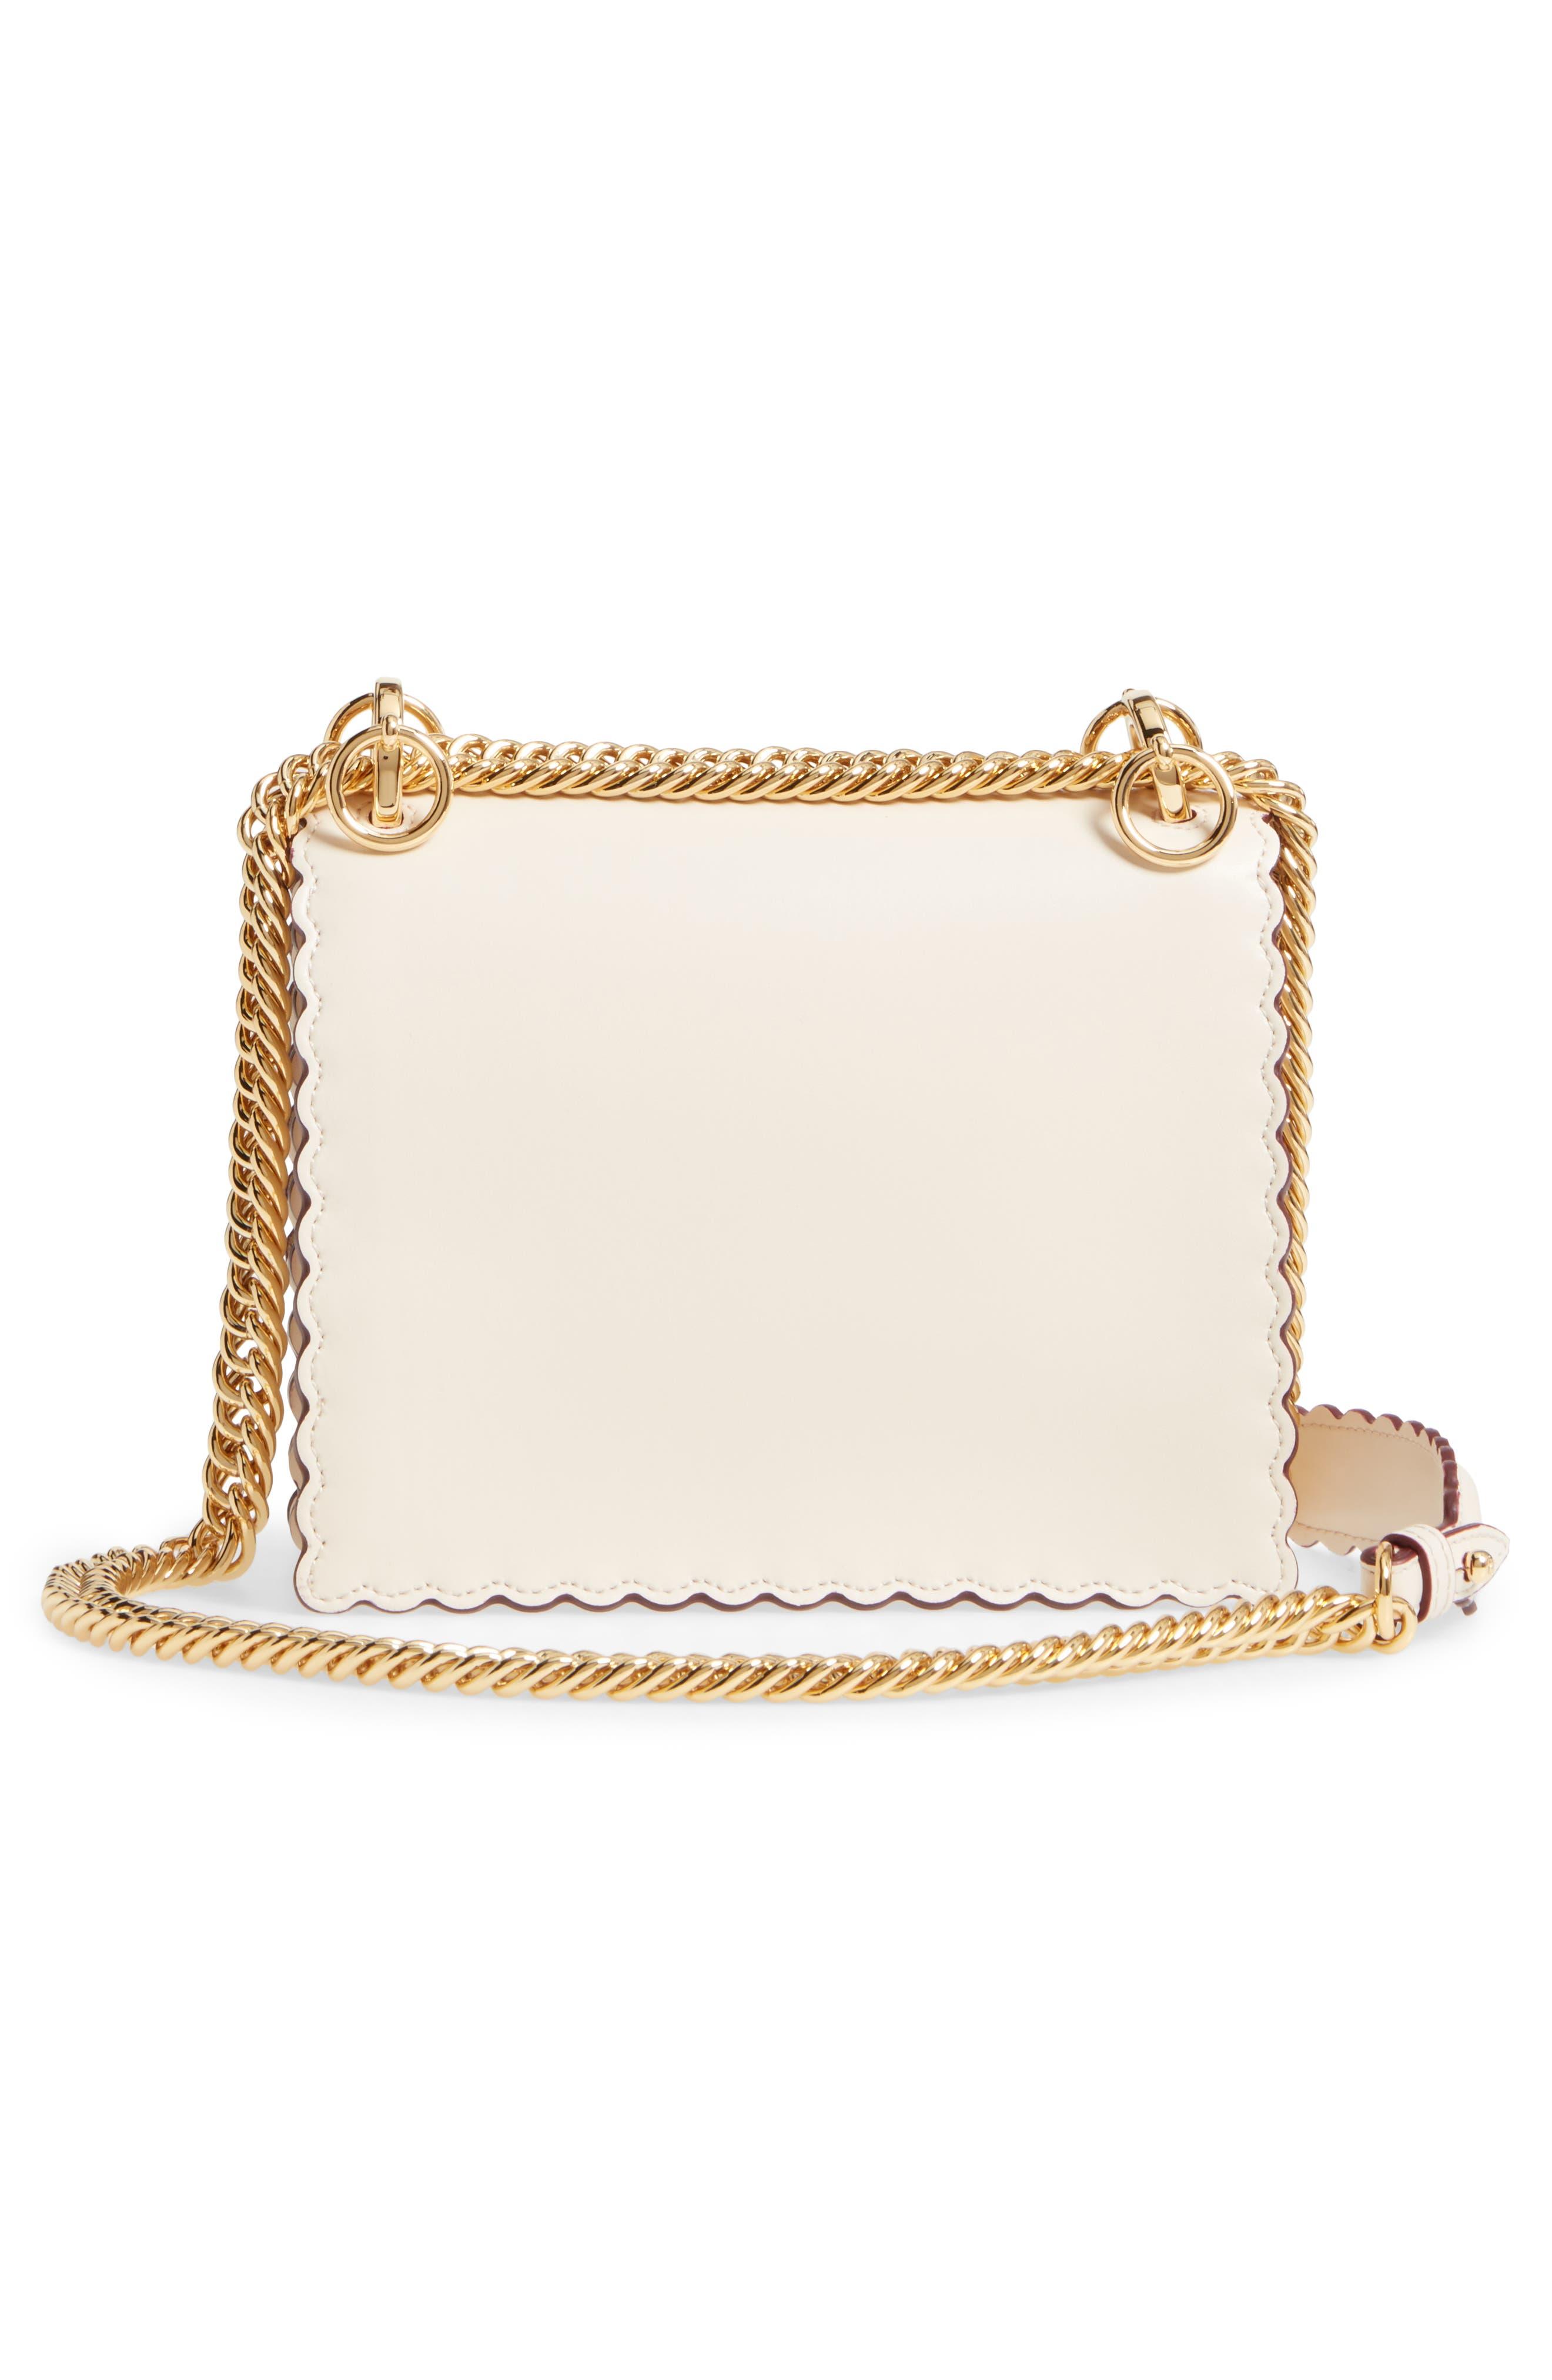 Alternate Image 3  - Fendi Mini Kan I Scalloped Leather Shoulder Bag